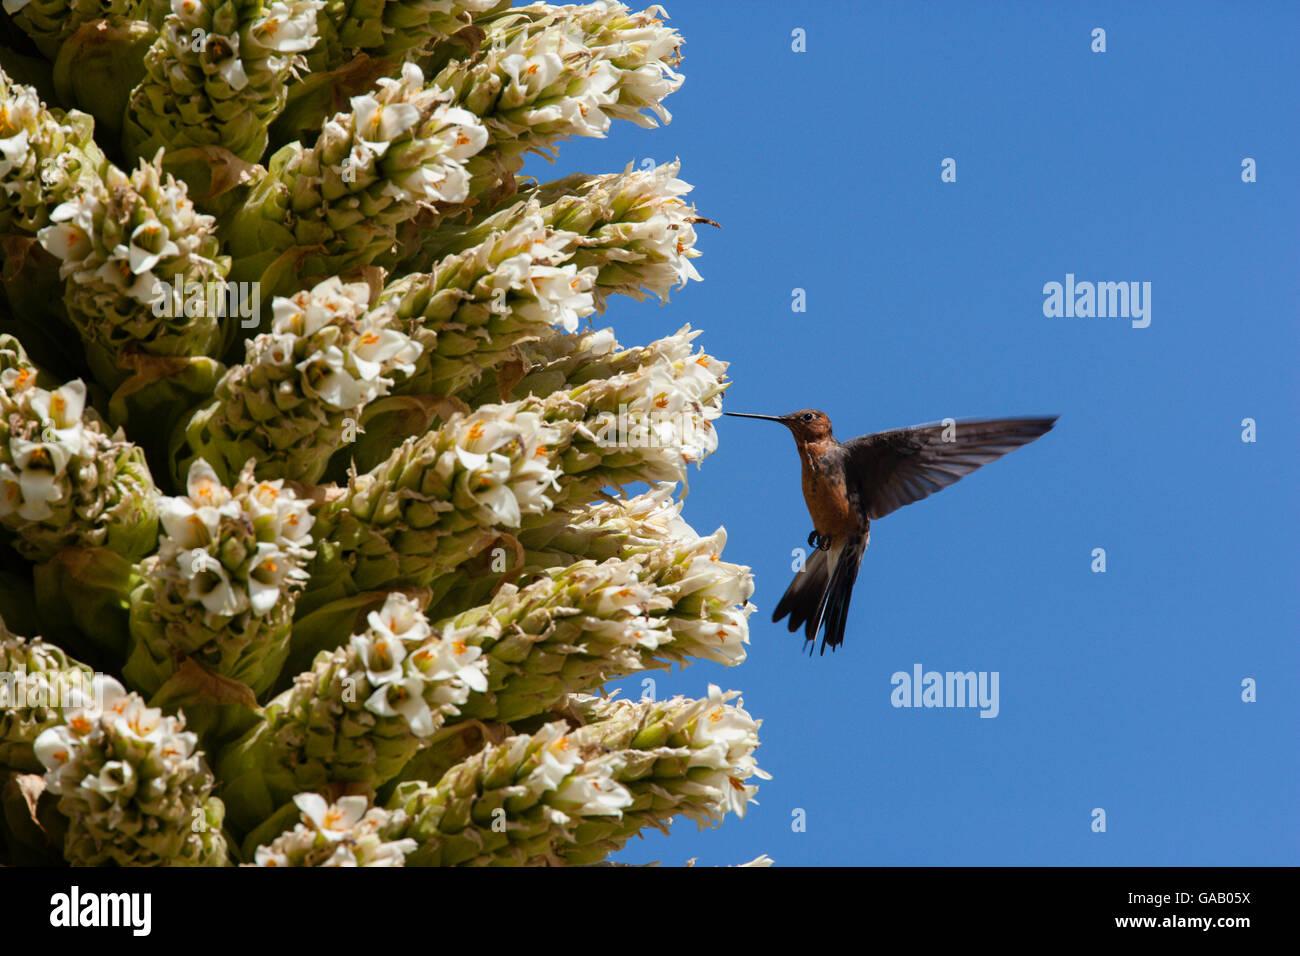 Giant humming bird (Patagona gigas) feeding from Queen of the Andes (Puya raymondii) flowers,  Cordillera Blanca Stock Photo